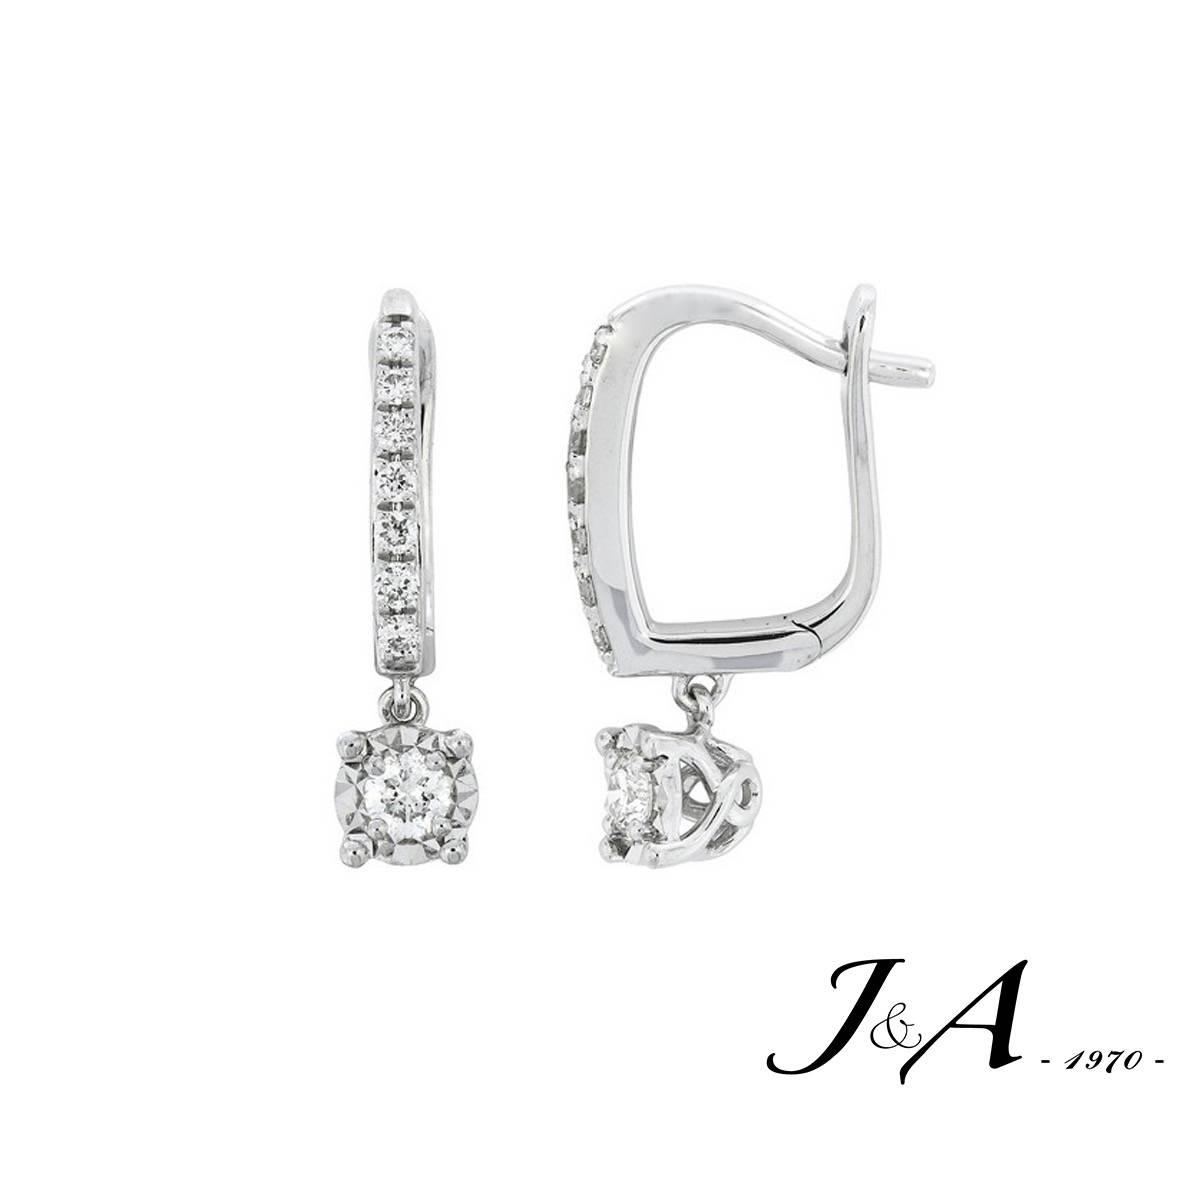 Juwelier Jan Maes - Trouwringen - Verlovingsringen - Juwelen - House of Weddings - 33